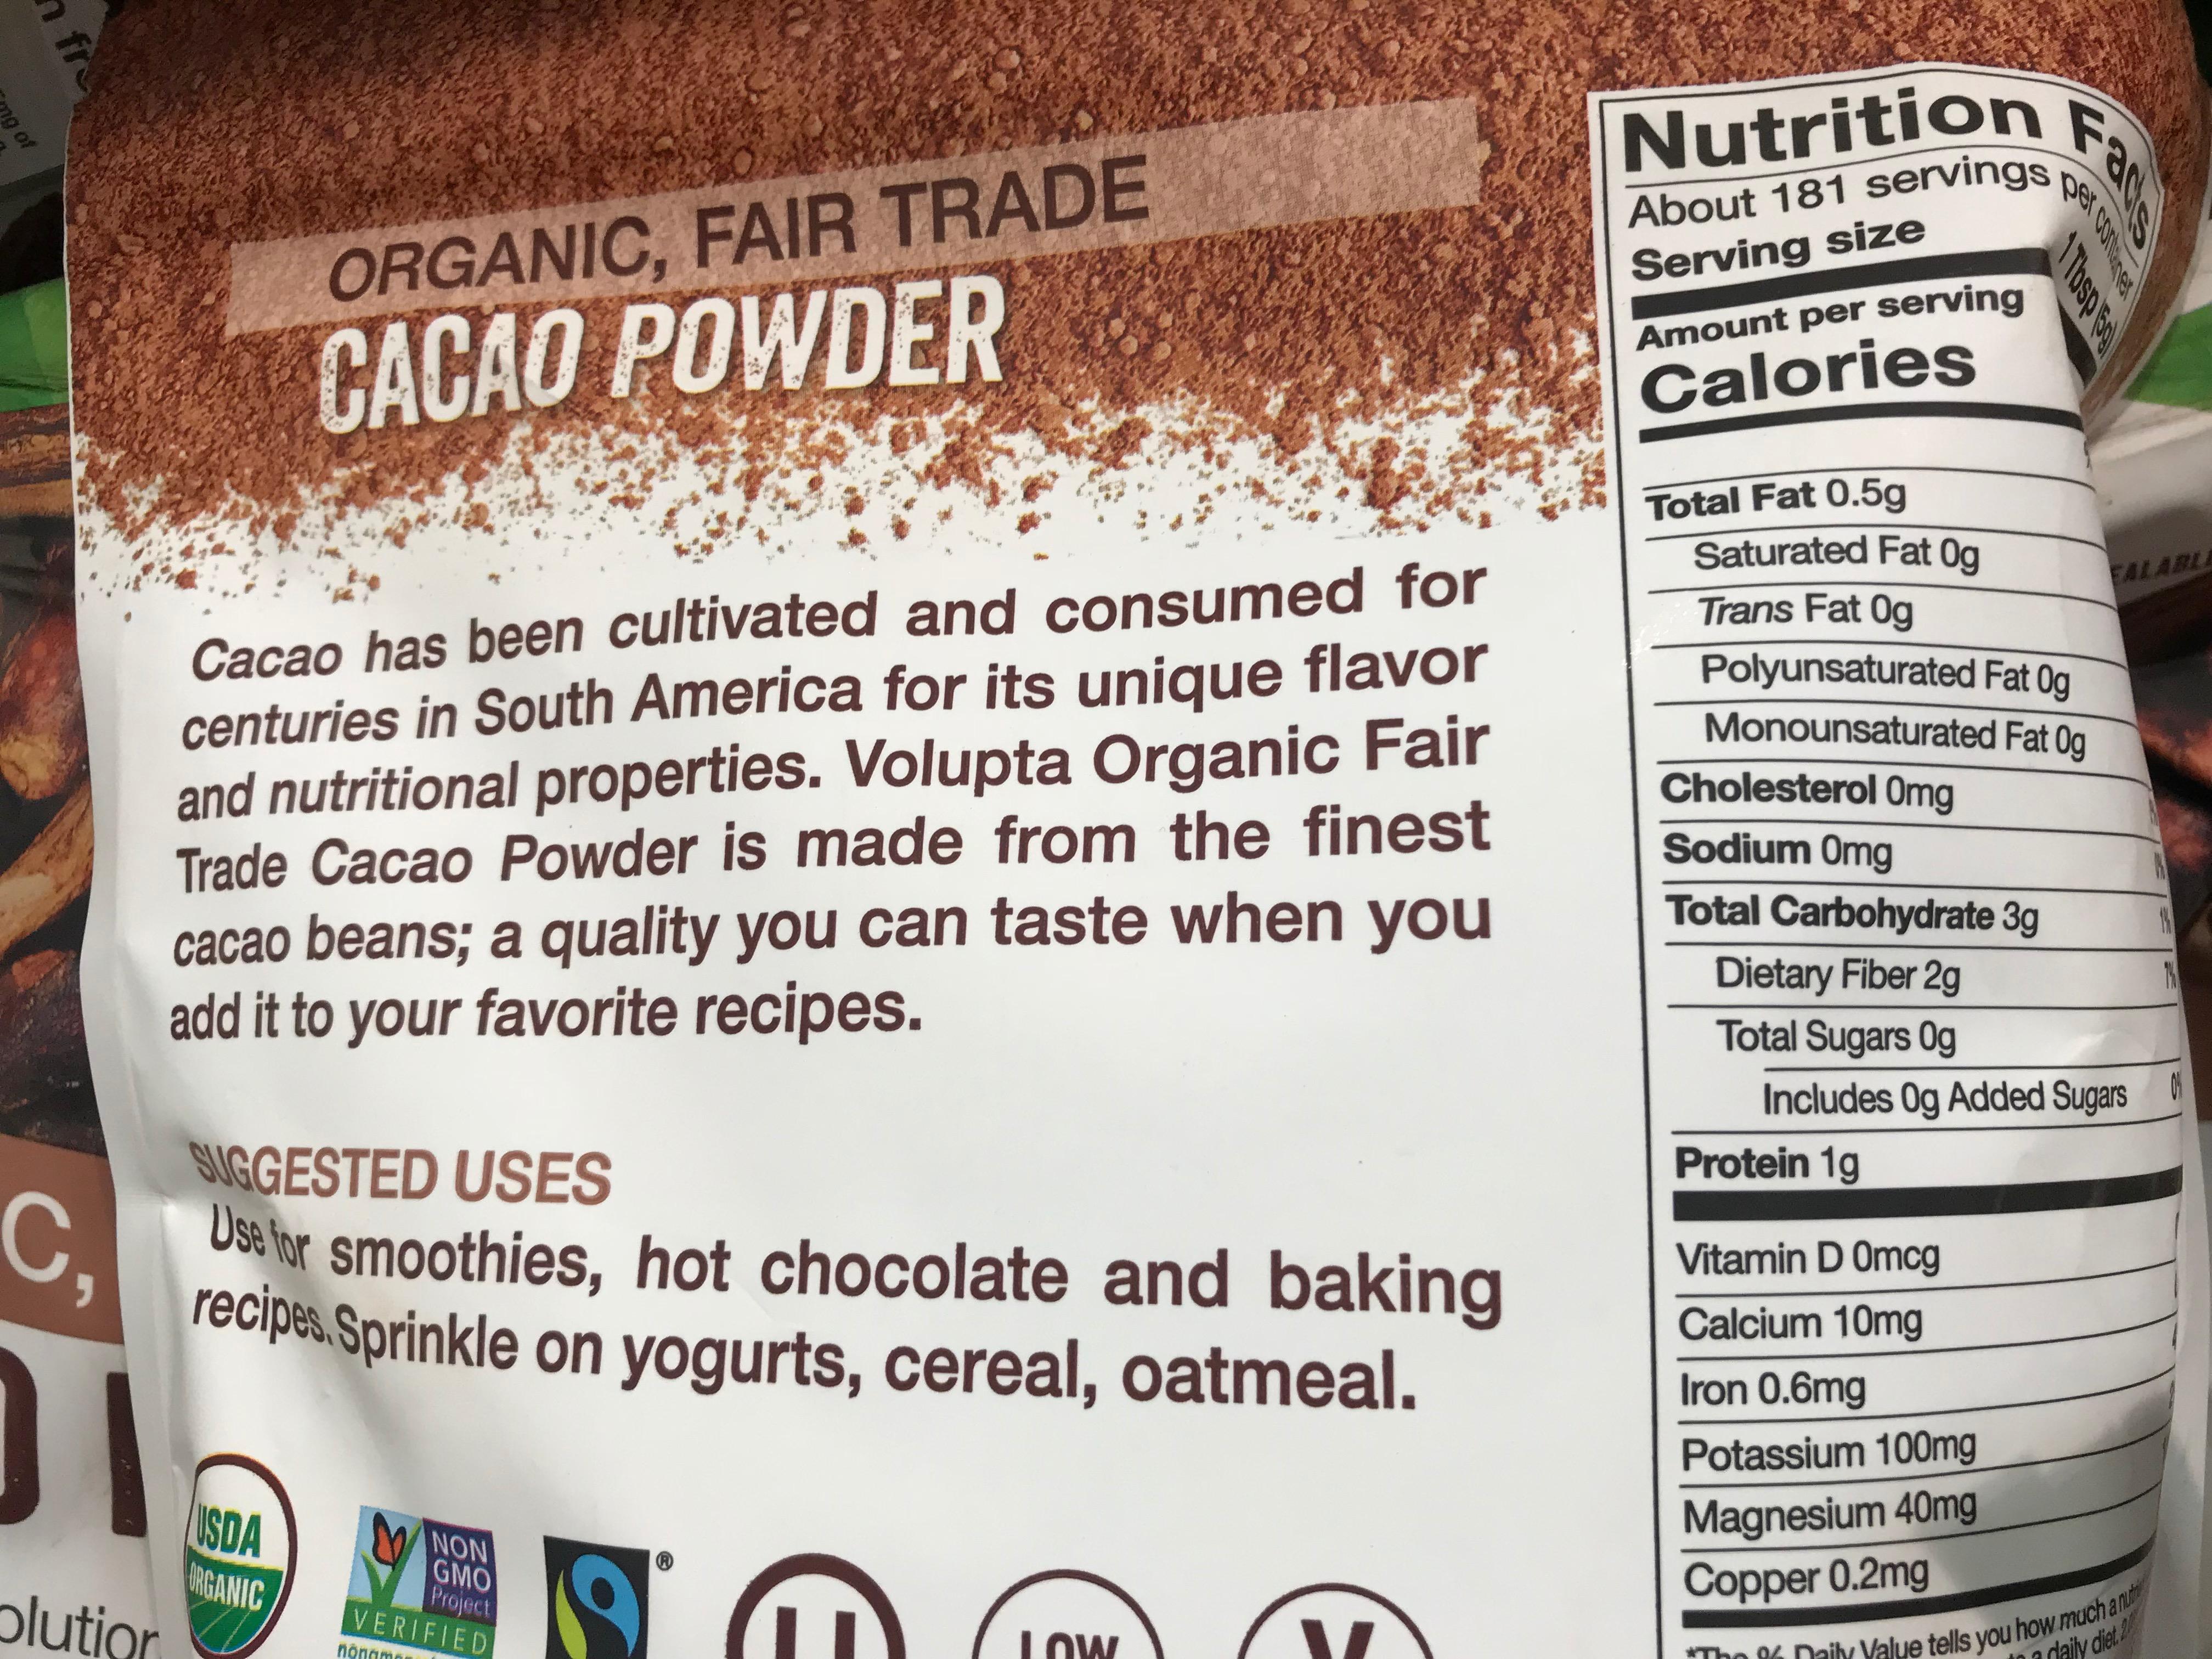 Volupta Organic Cacao Powder Product Description Nutrition